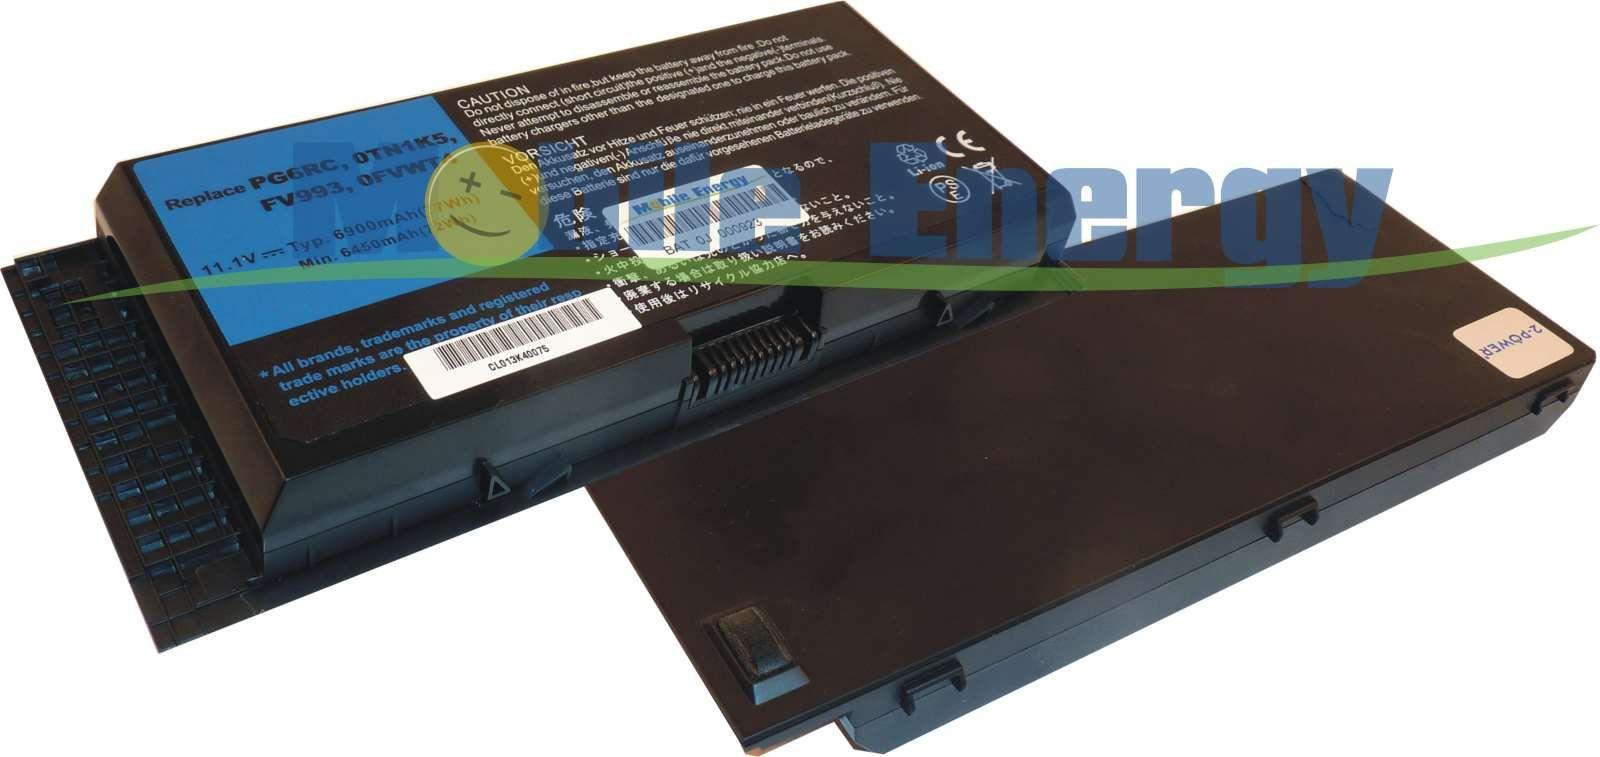 Mobile-Energy Baterie DELL Precision M4600 - 11.1v 7800mAh - Li-